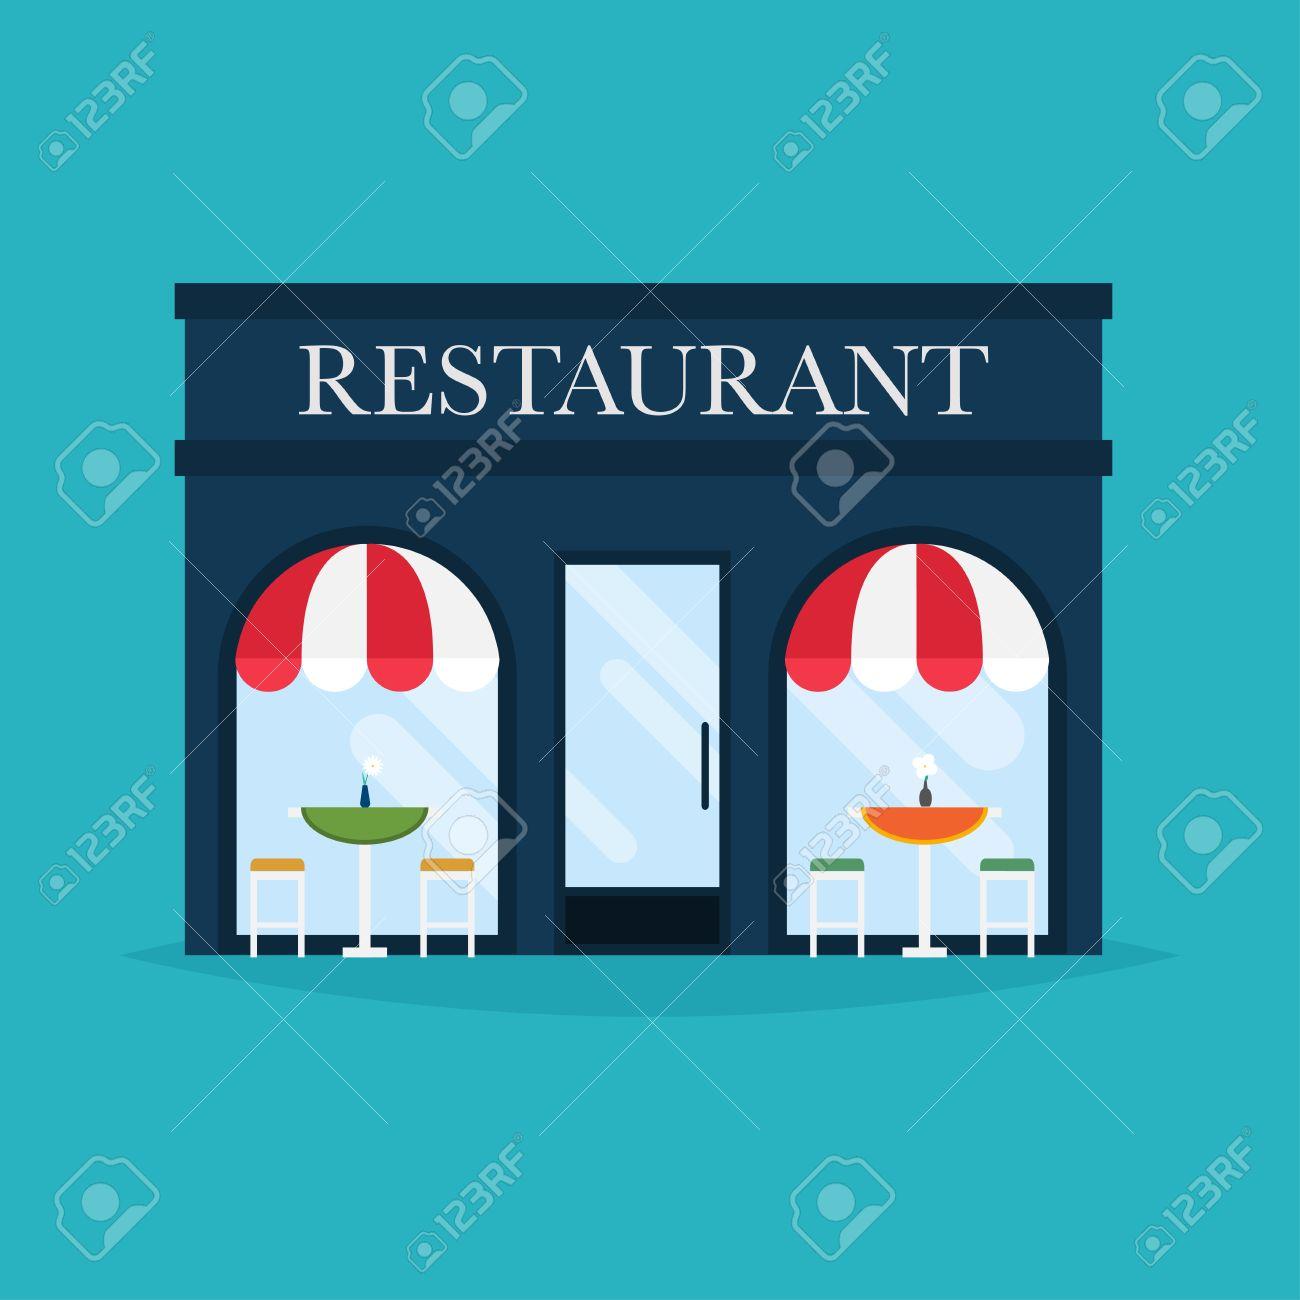 Building cartoon clipart restaurant building and restaurant building - Vector Illustration Of Restaurant Building Facade Icons Ideal For Restaurant Business Web Publications And